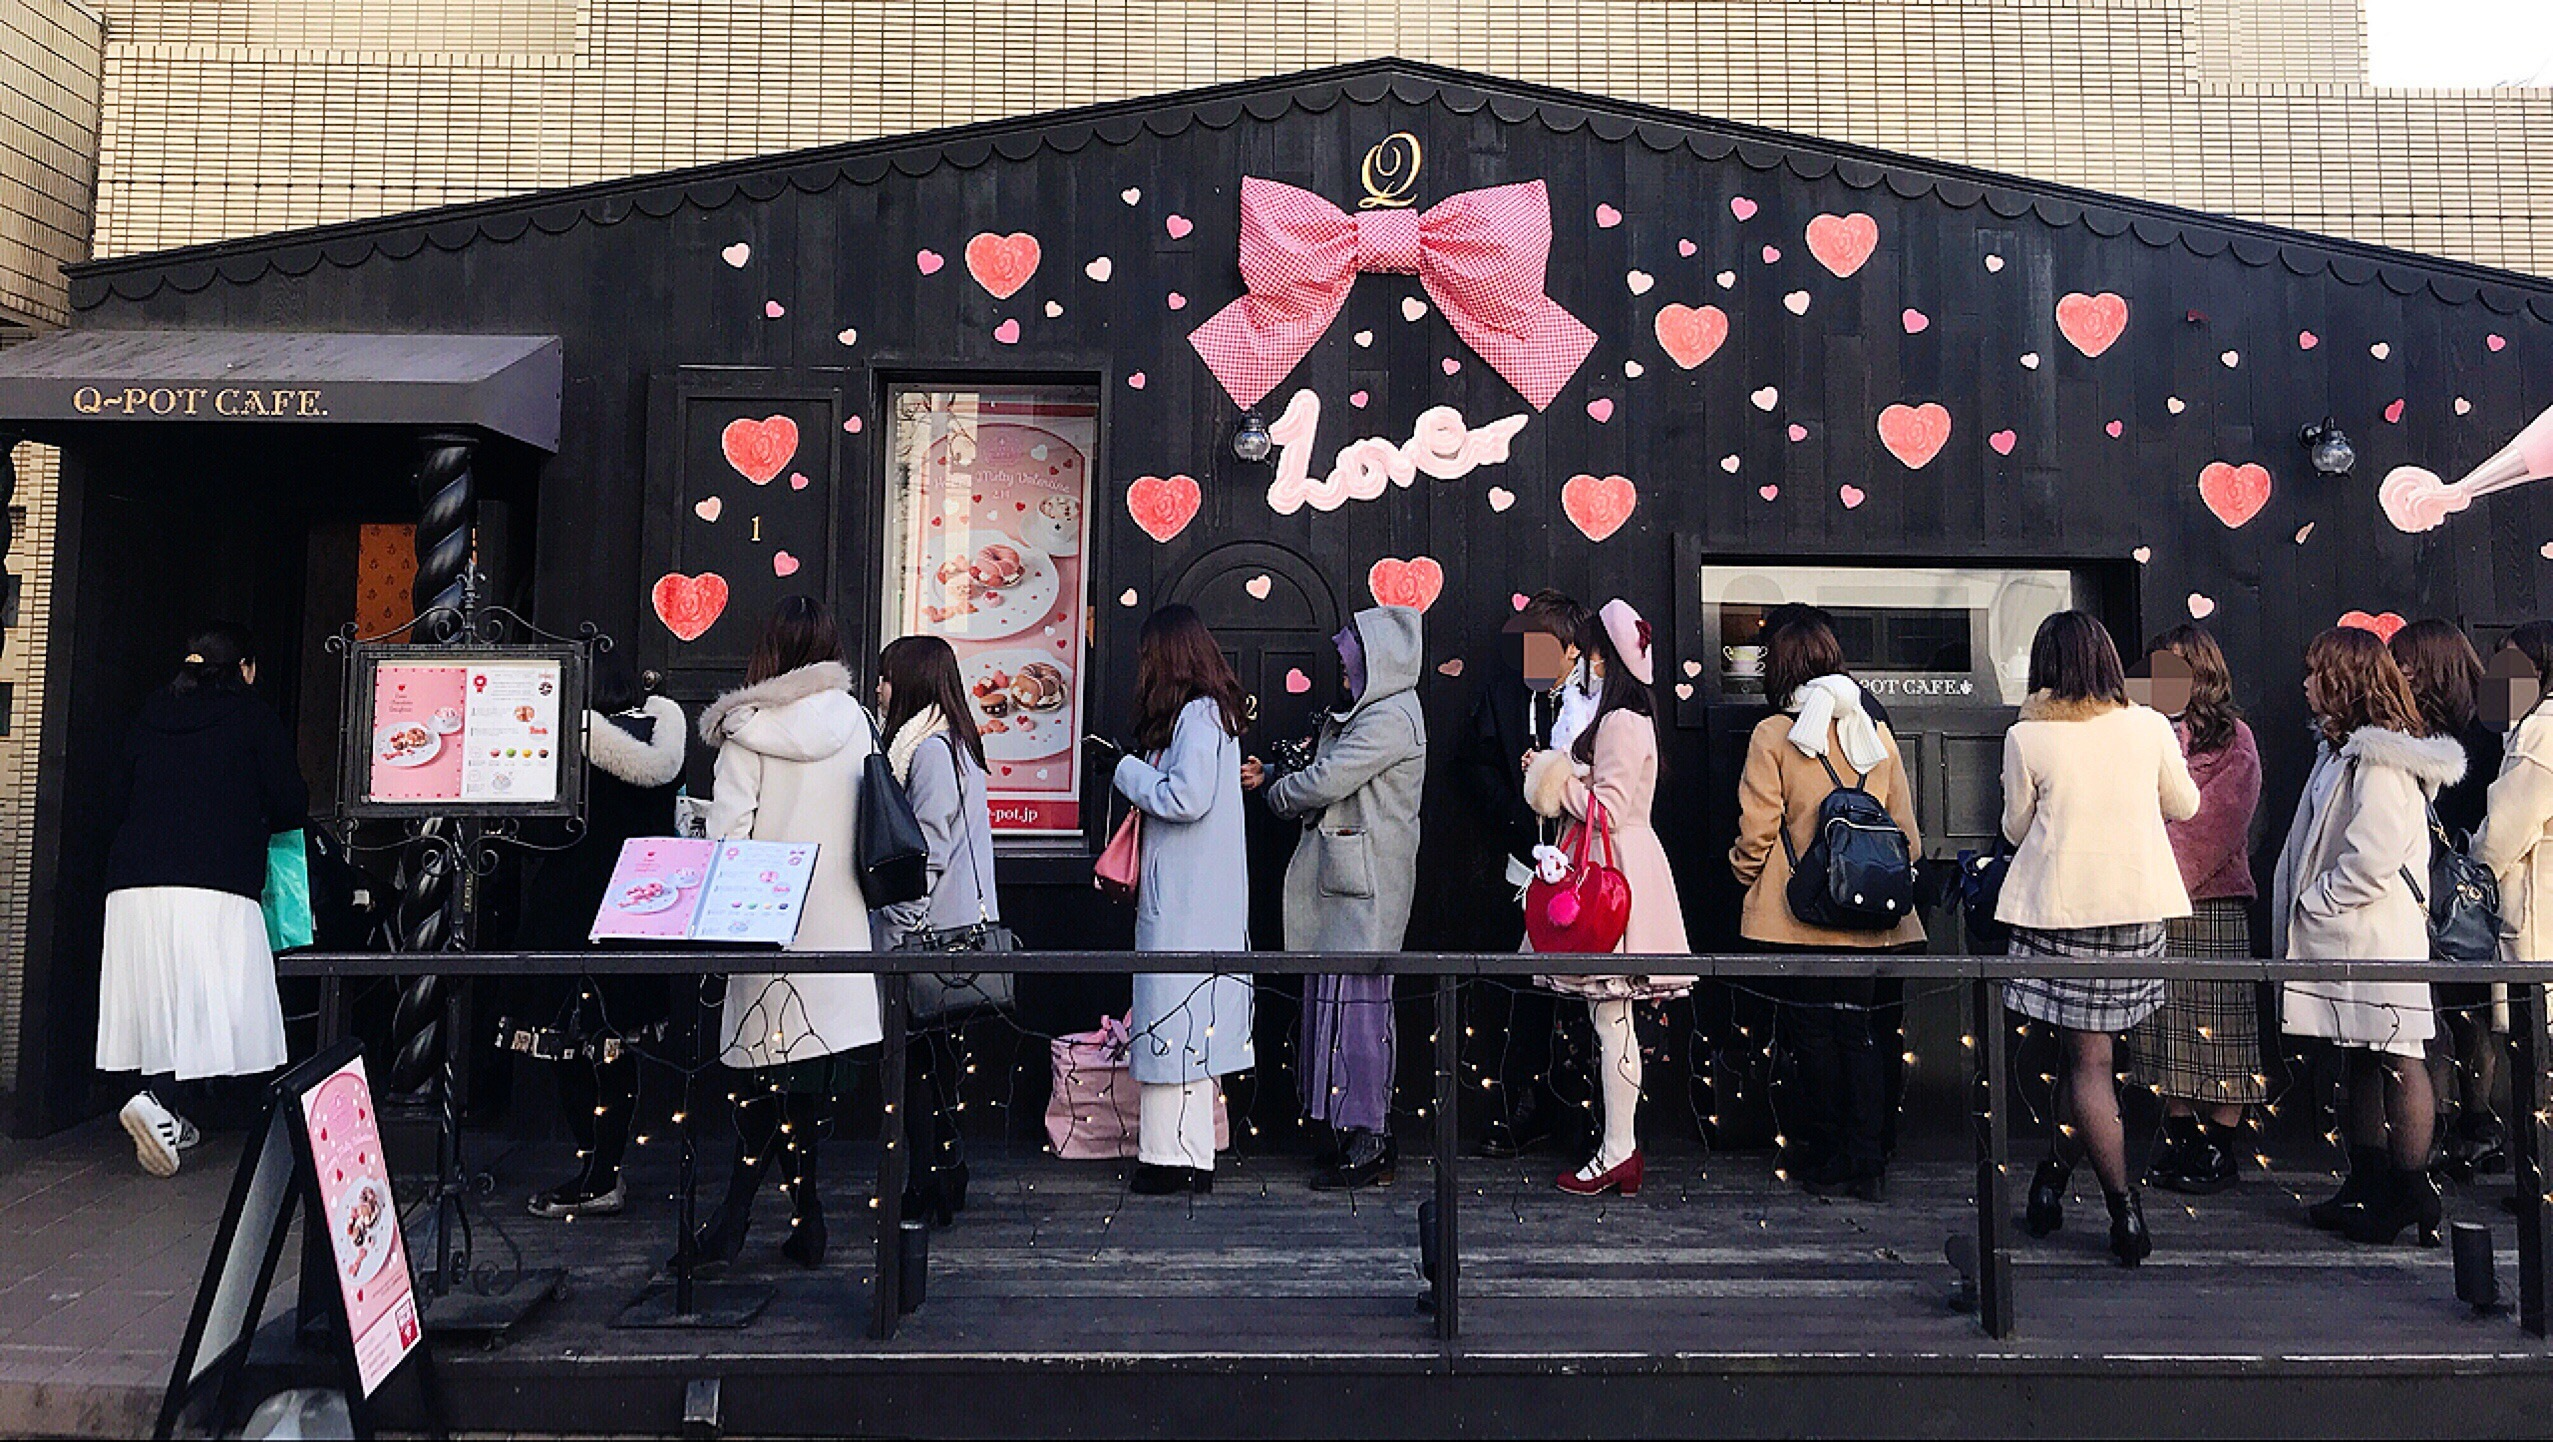 Vol.37♡ 可愛すぎる!Q-pot CAFE.のバレンタイン限定メニュー❤︎_1_1